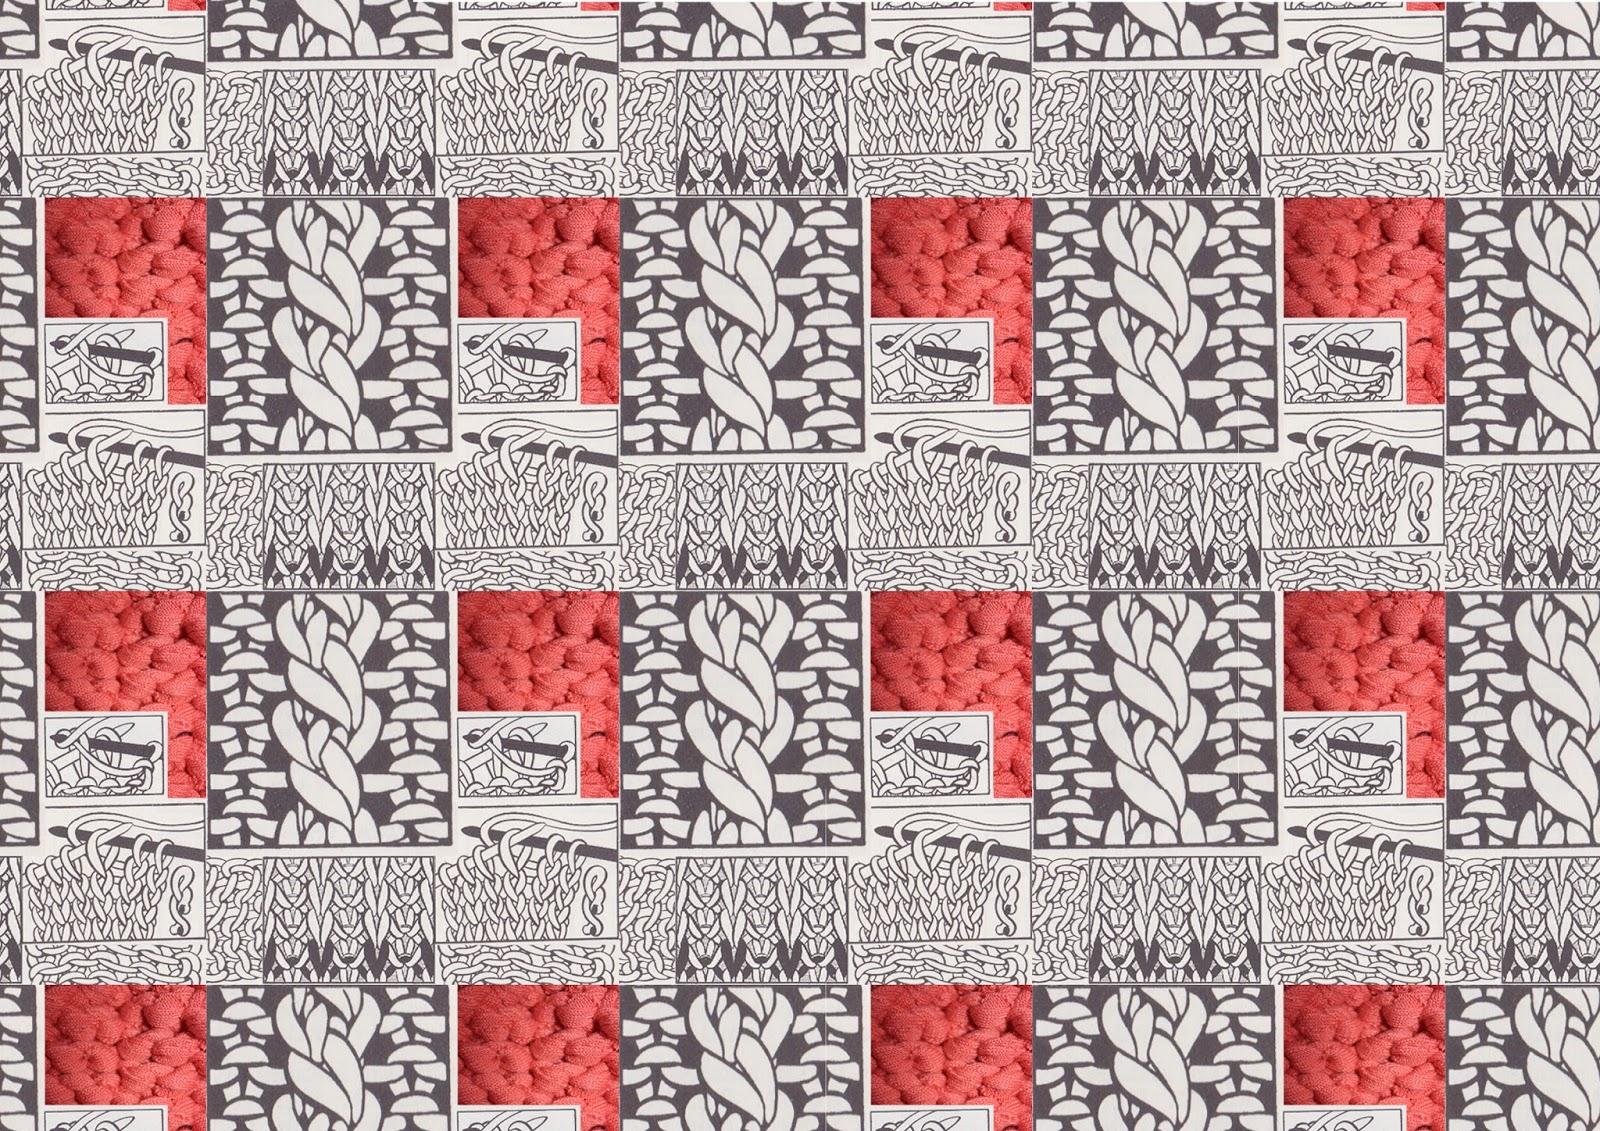 Knitting Pattern Diagrams : I am EJP: Knitting Pattern Diagram Digital Prints